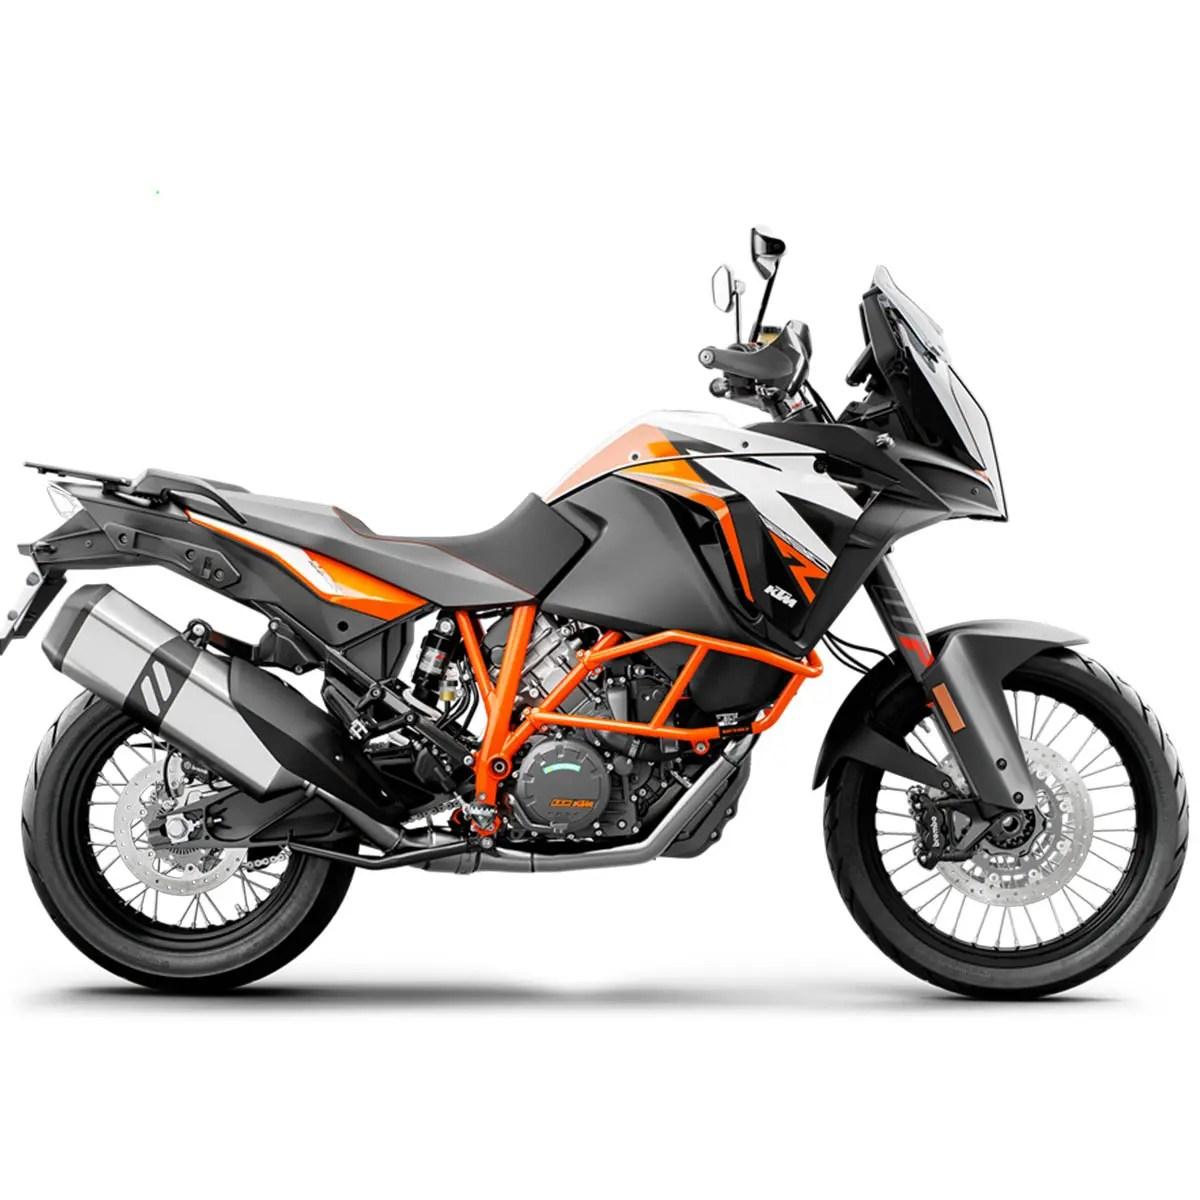 KTM-1290-Super-Adventure-R-2020KTM-1290-Super-Adventure-R-2020